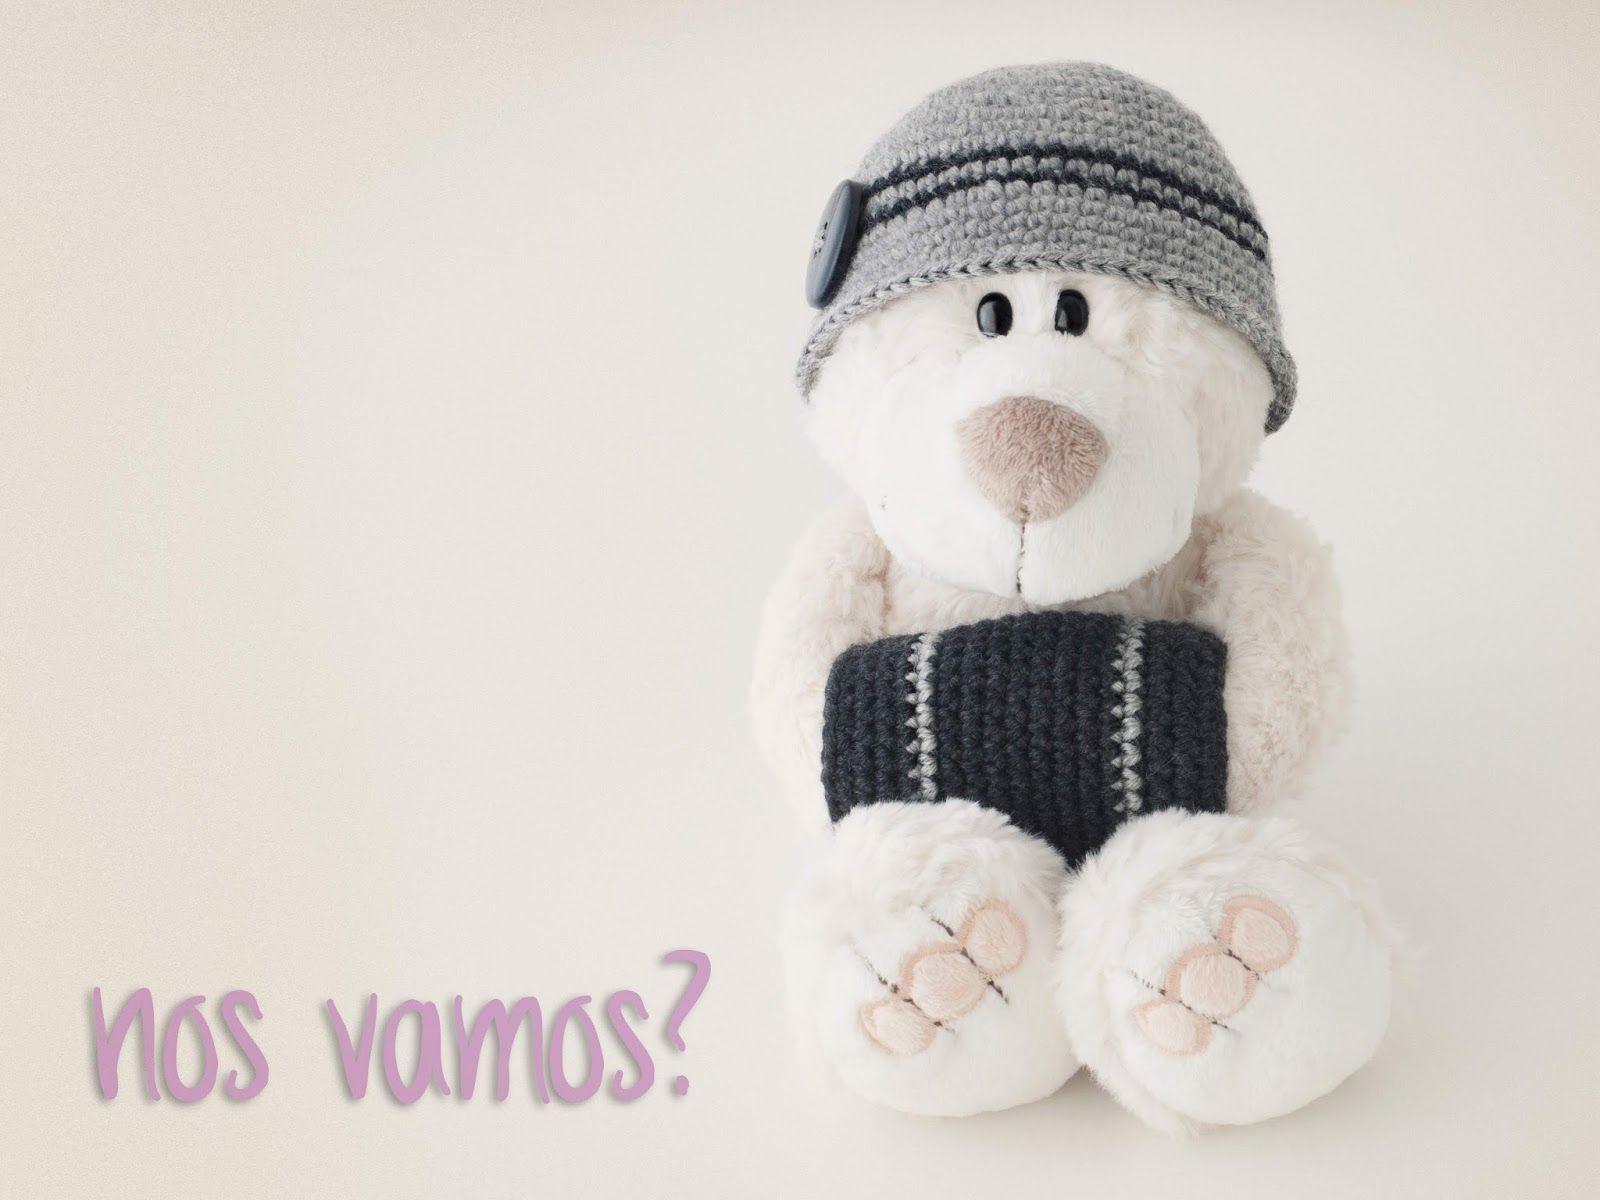 Dorable Patrón De Crochet Sombrero Del Mono Libre Modelo - Ideas de ...